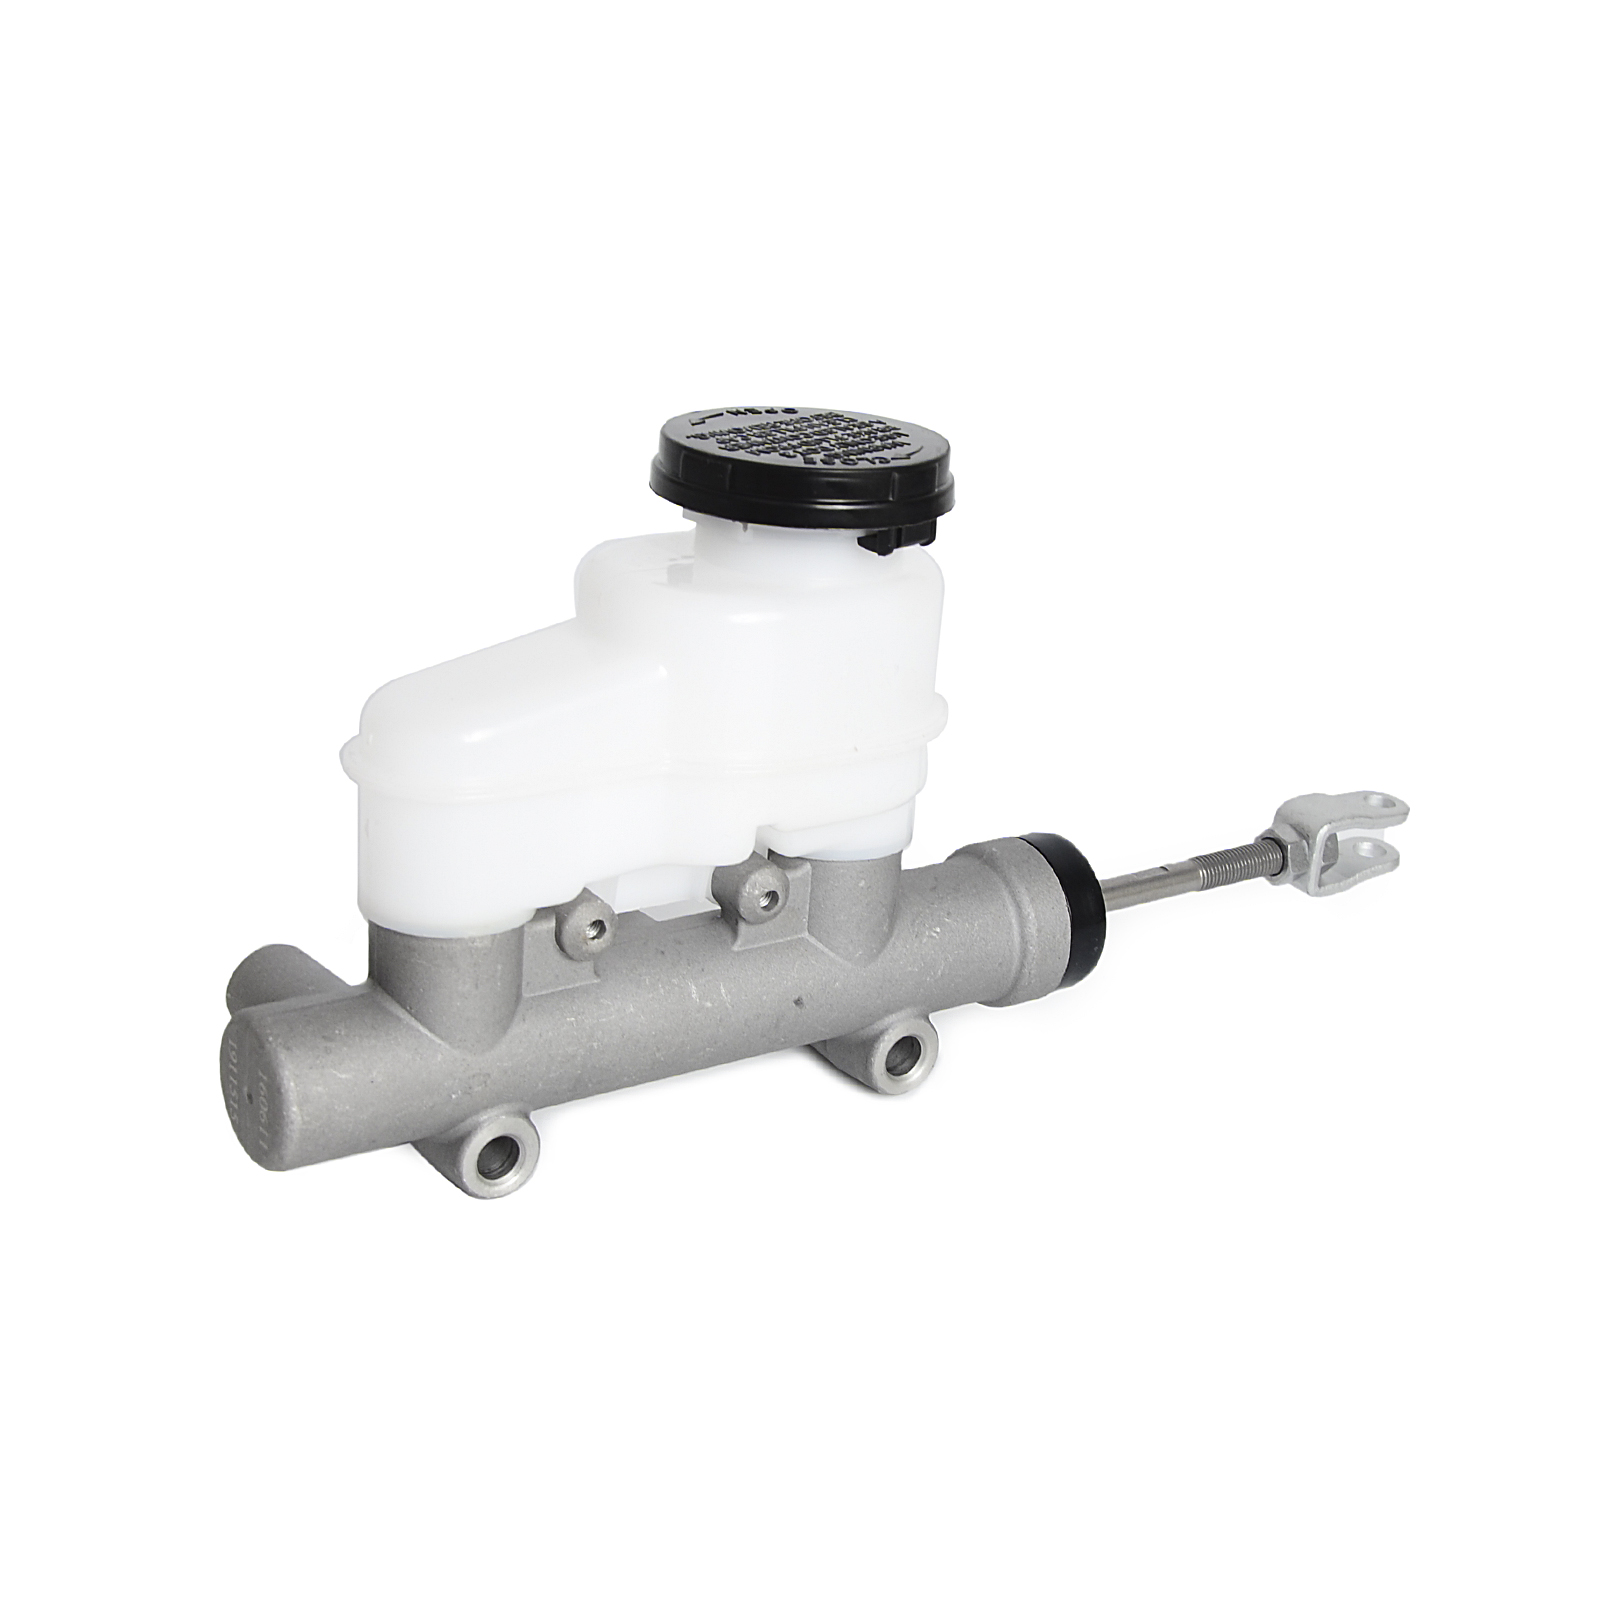 Brake Master Cylinder Assembly fits Polaris RZR 800 2008-2014 OEM 1911515